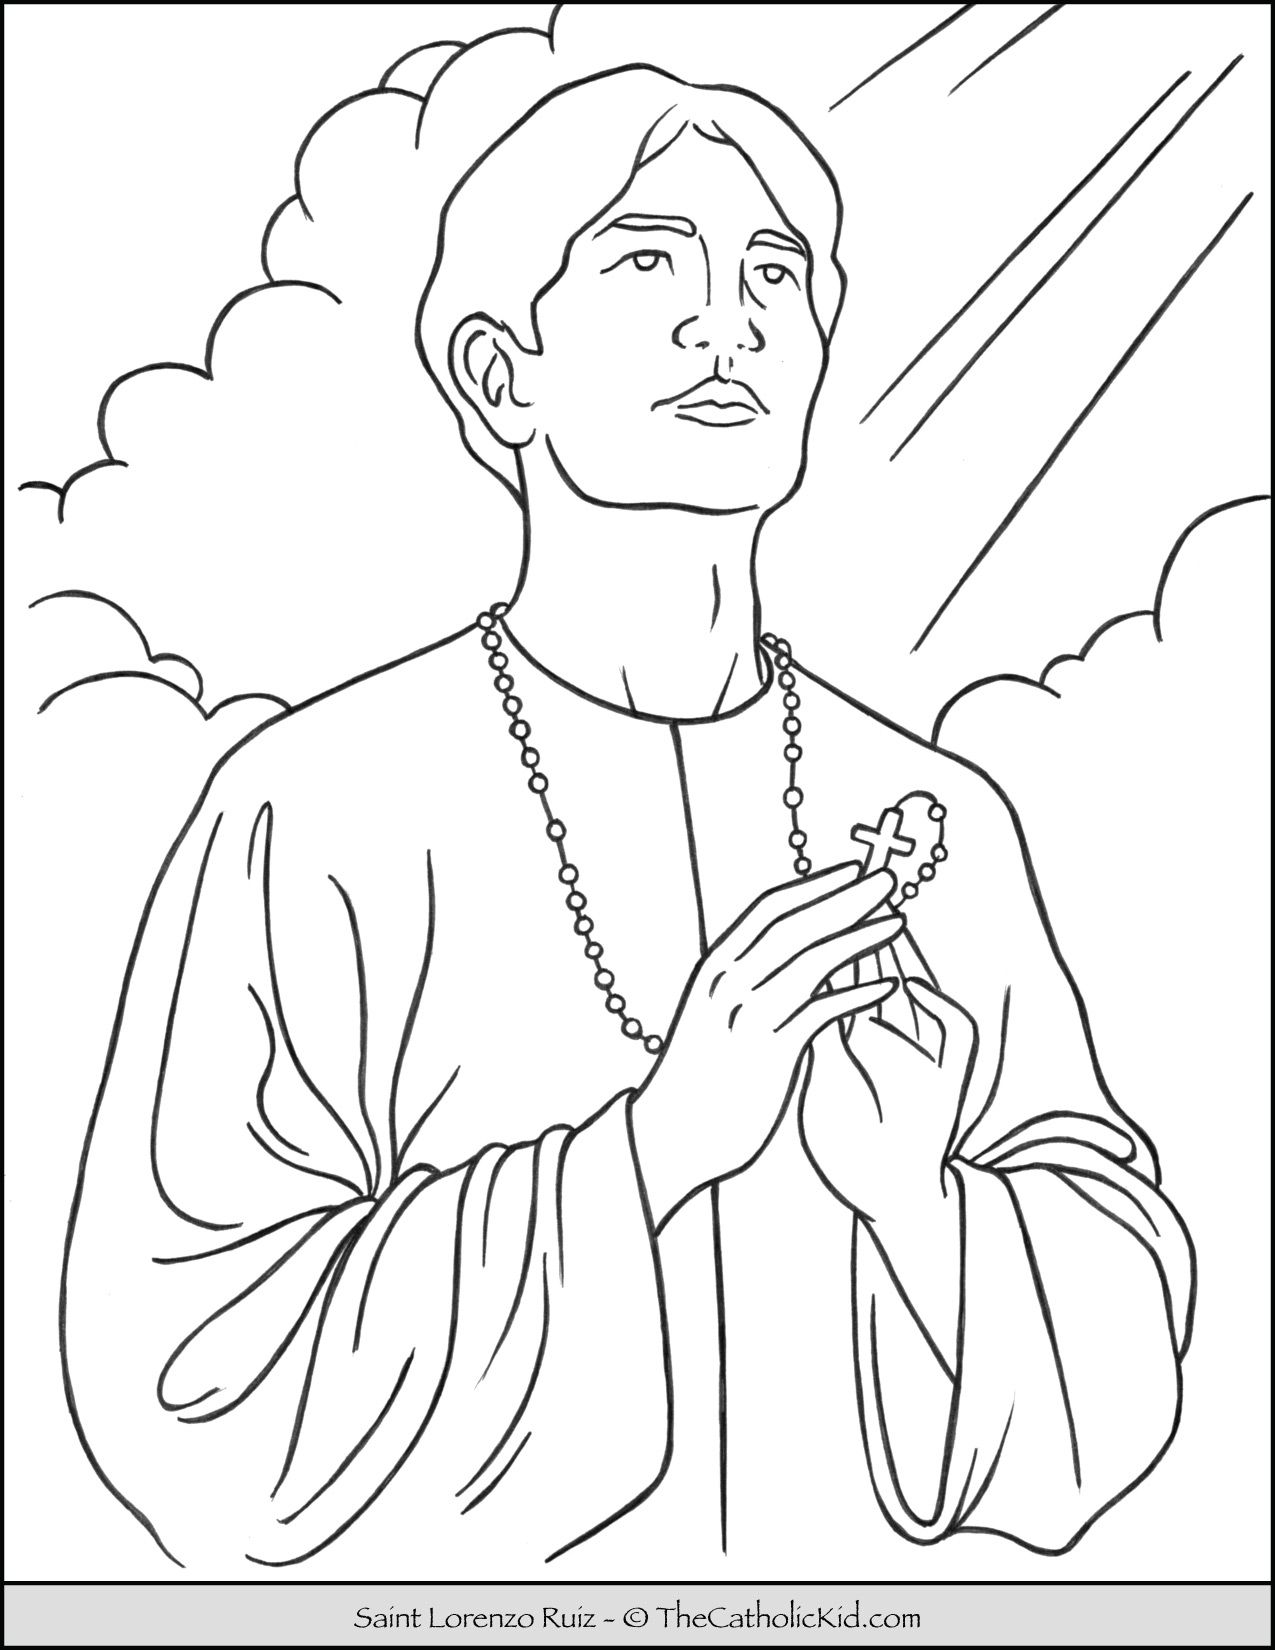 Saint Lorenzo Ruiz Coloring Page Coloring Pages Saint Lorenzo